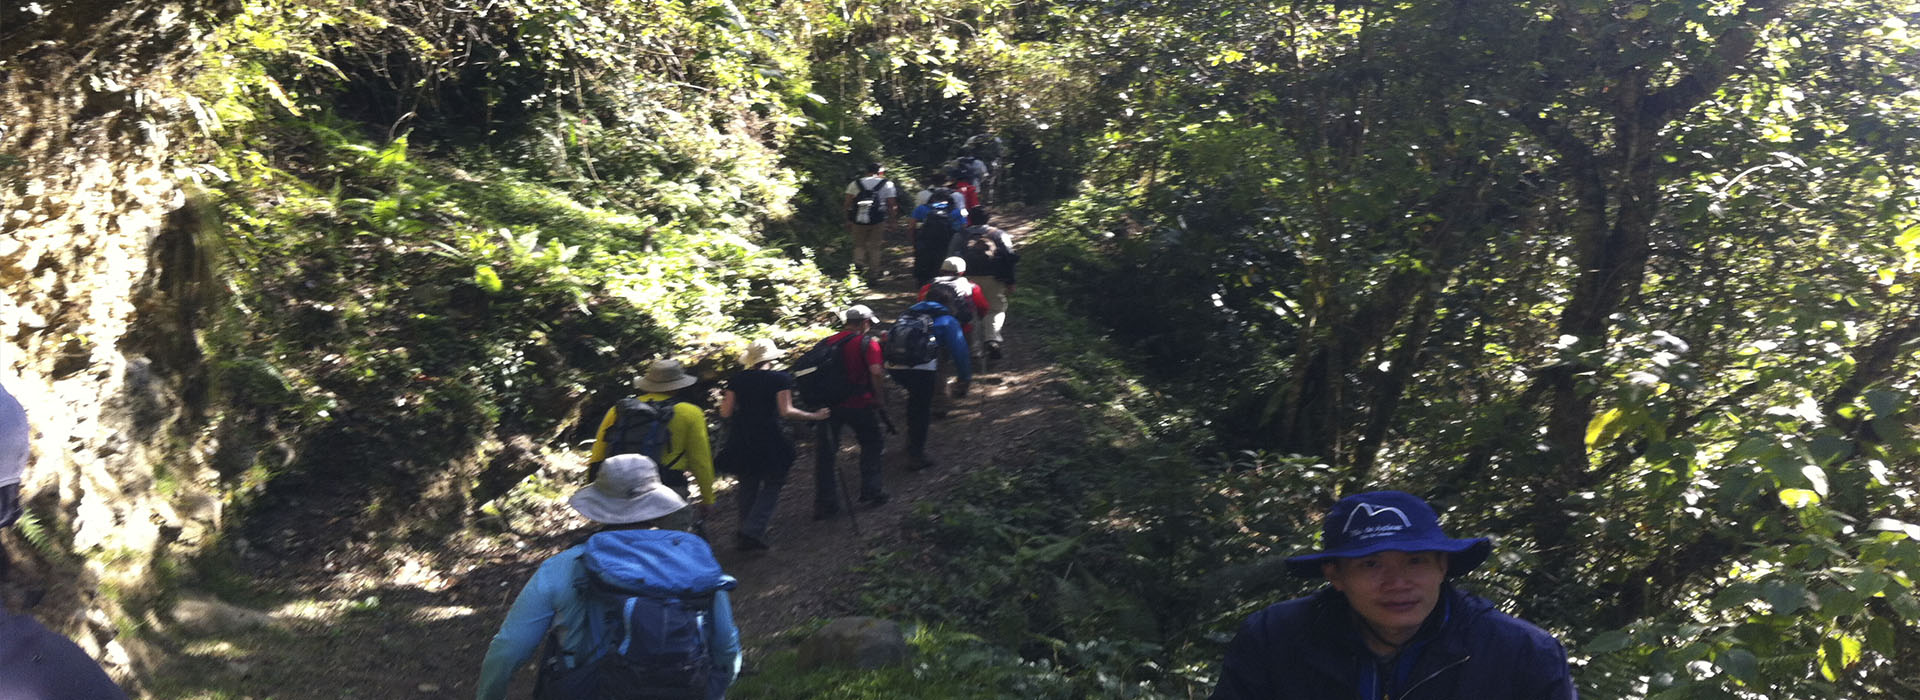 Salkantay Trek to Machu Picchu 5 days return by bus last day